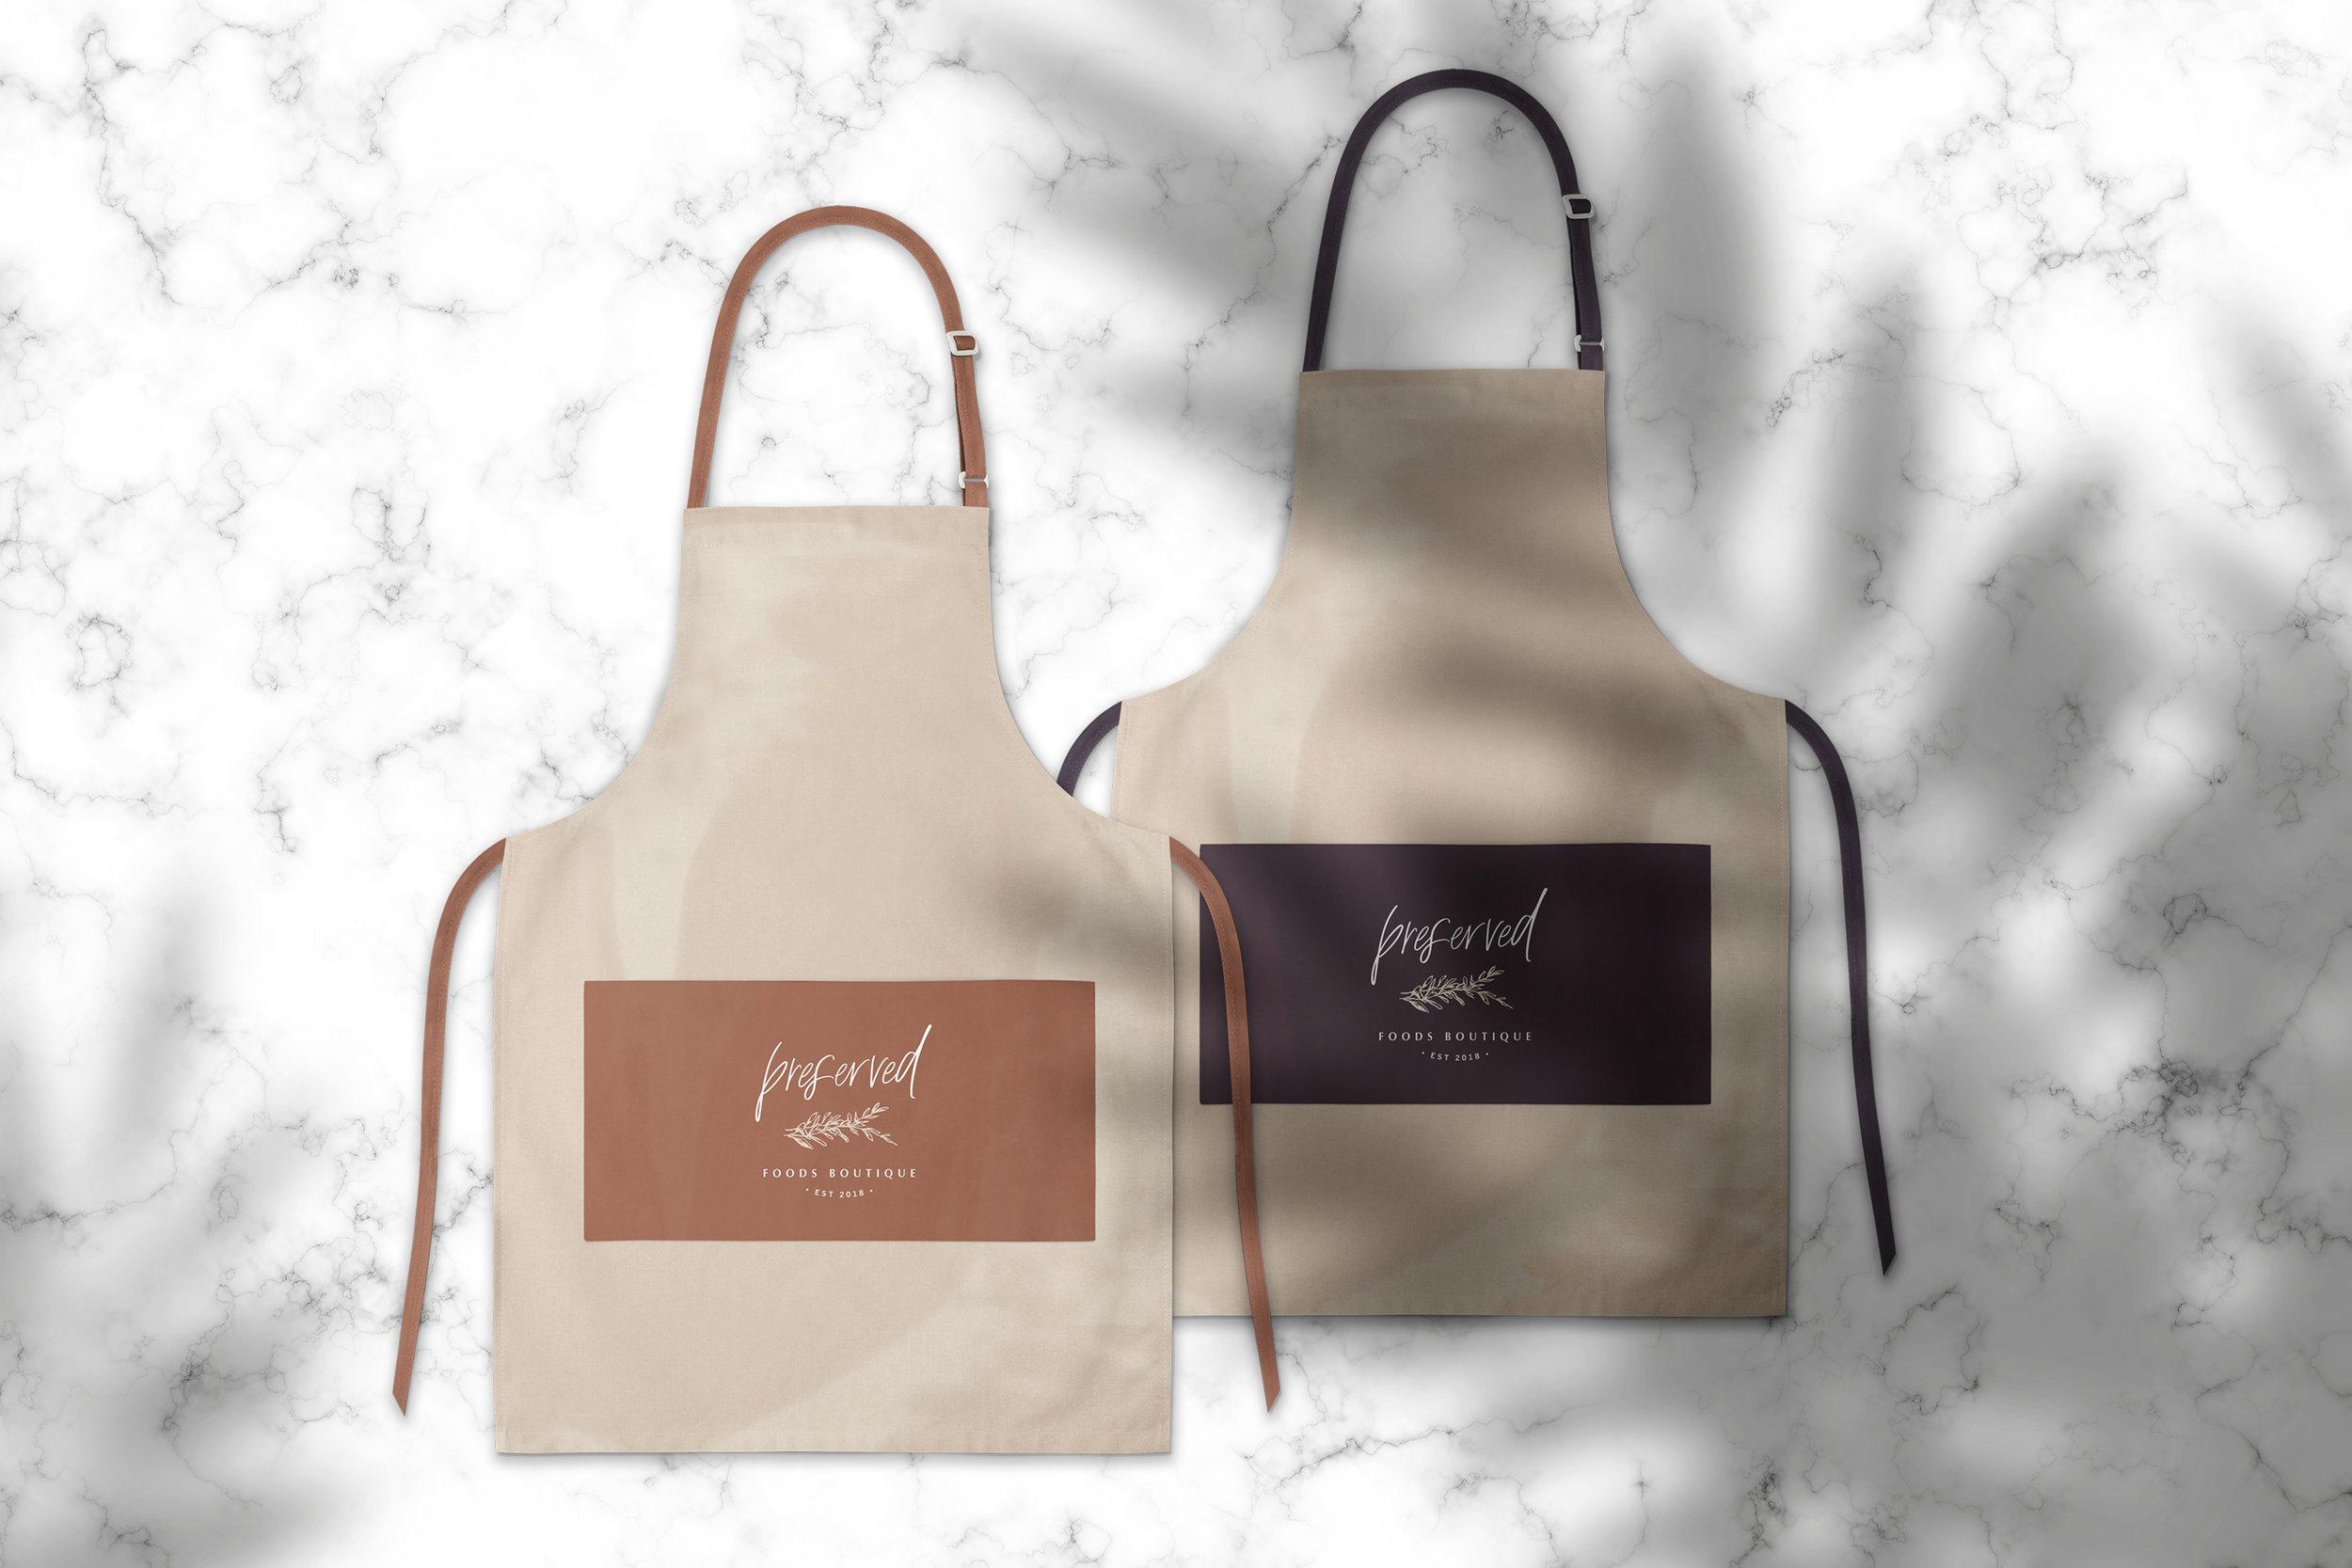 Preserved Foods Boutique - Logo Design and Branding - Bexley Design Co